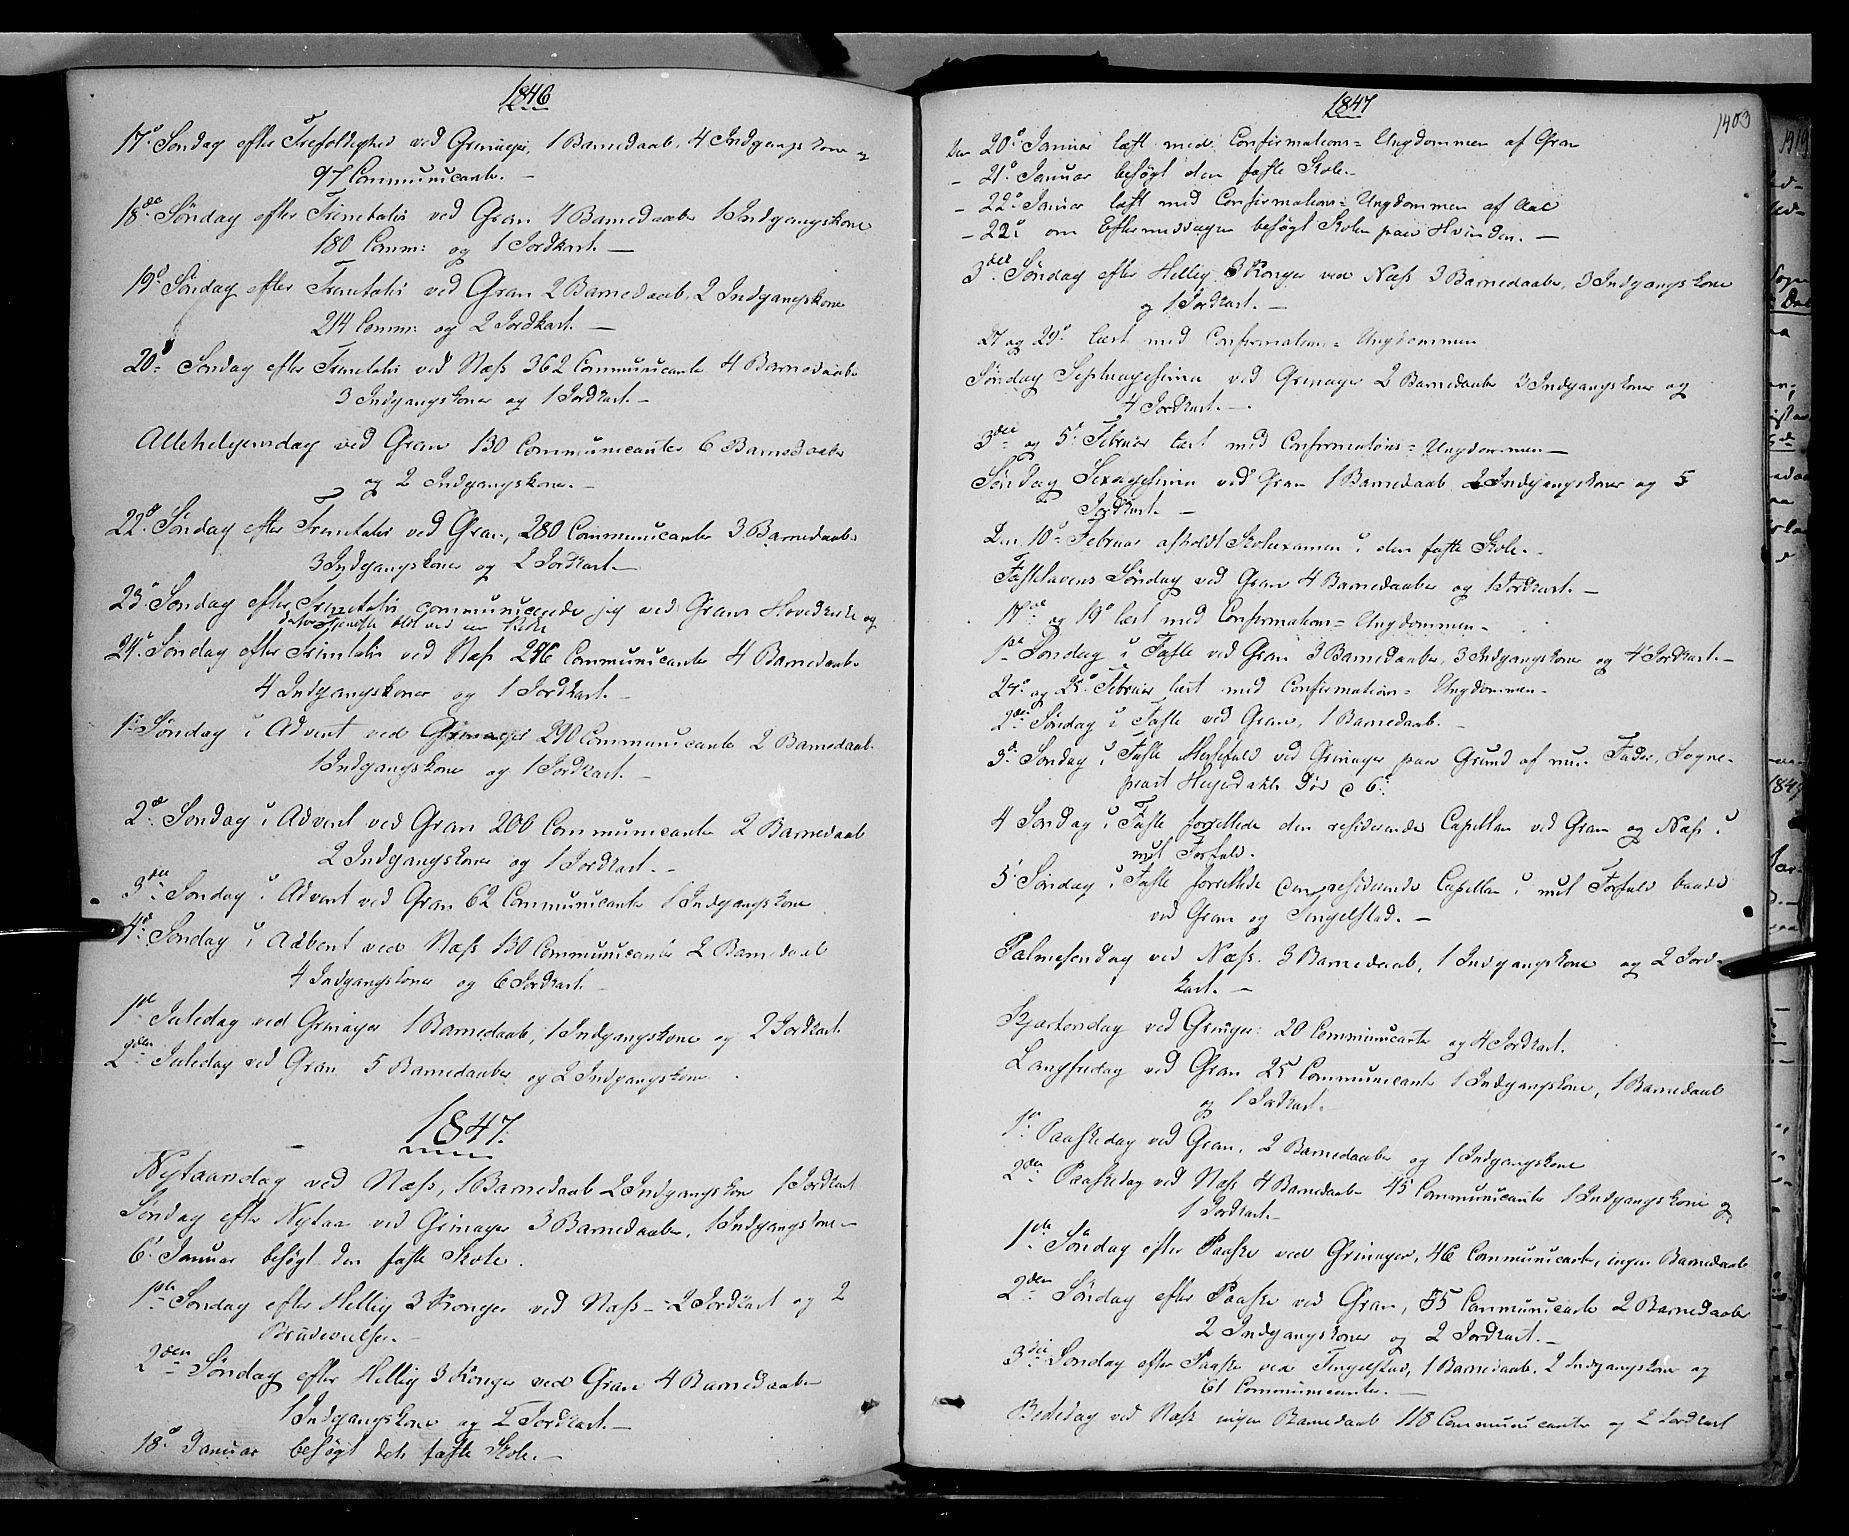 SAH, Gran prestekontor, Ministerialbok nr. 11, 1842-1856, s. 1402-1403